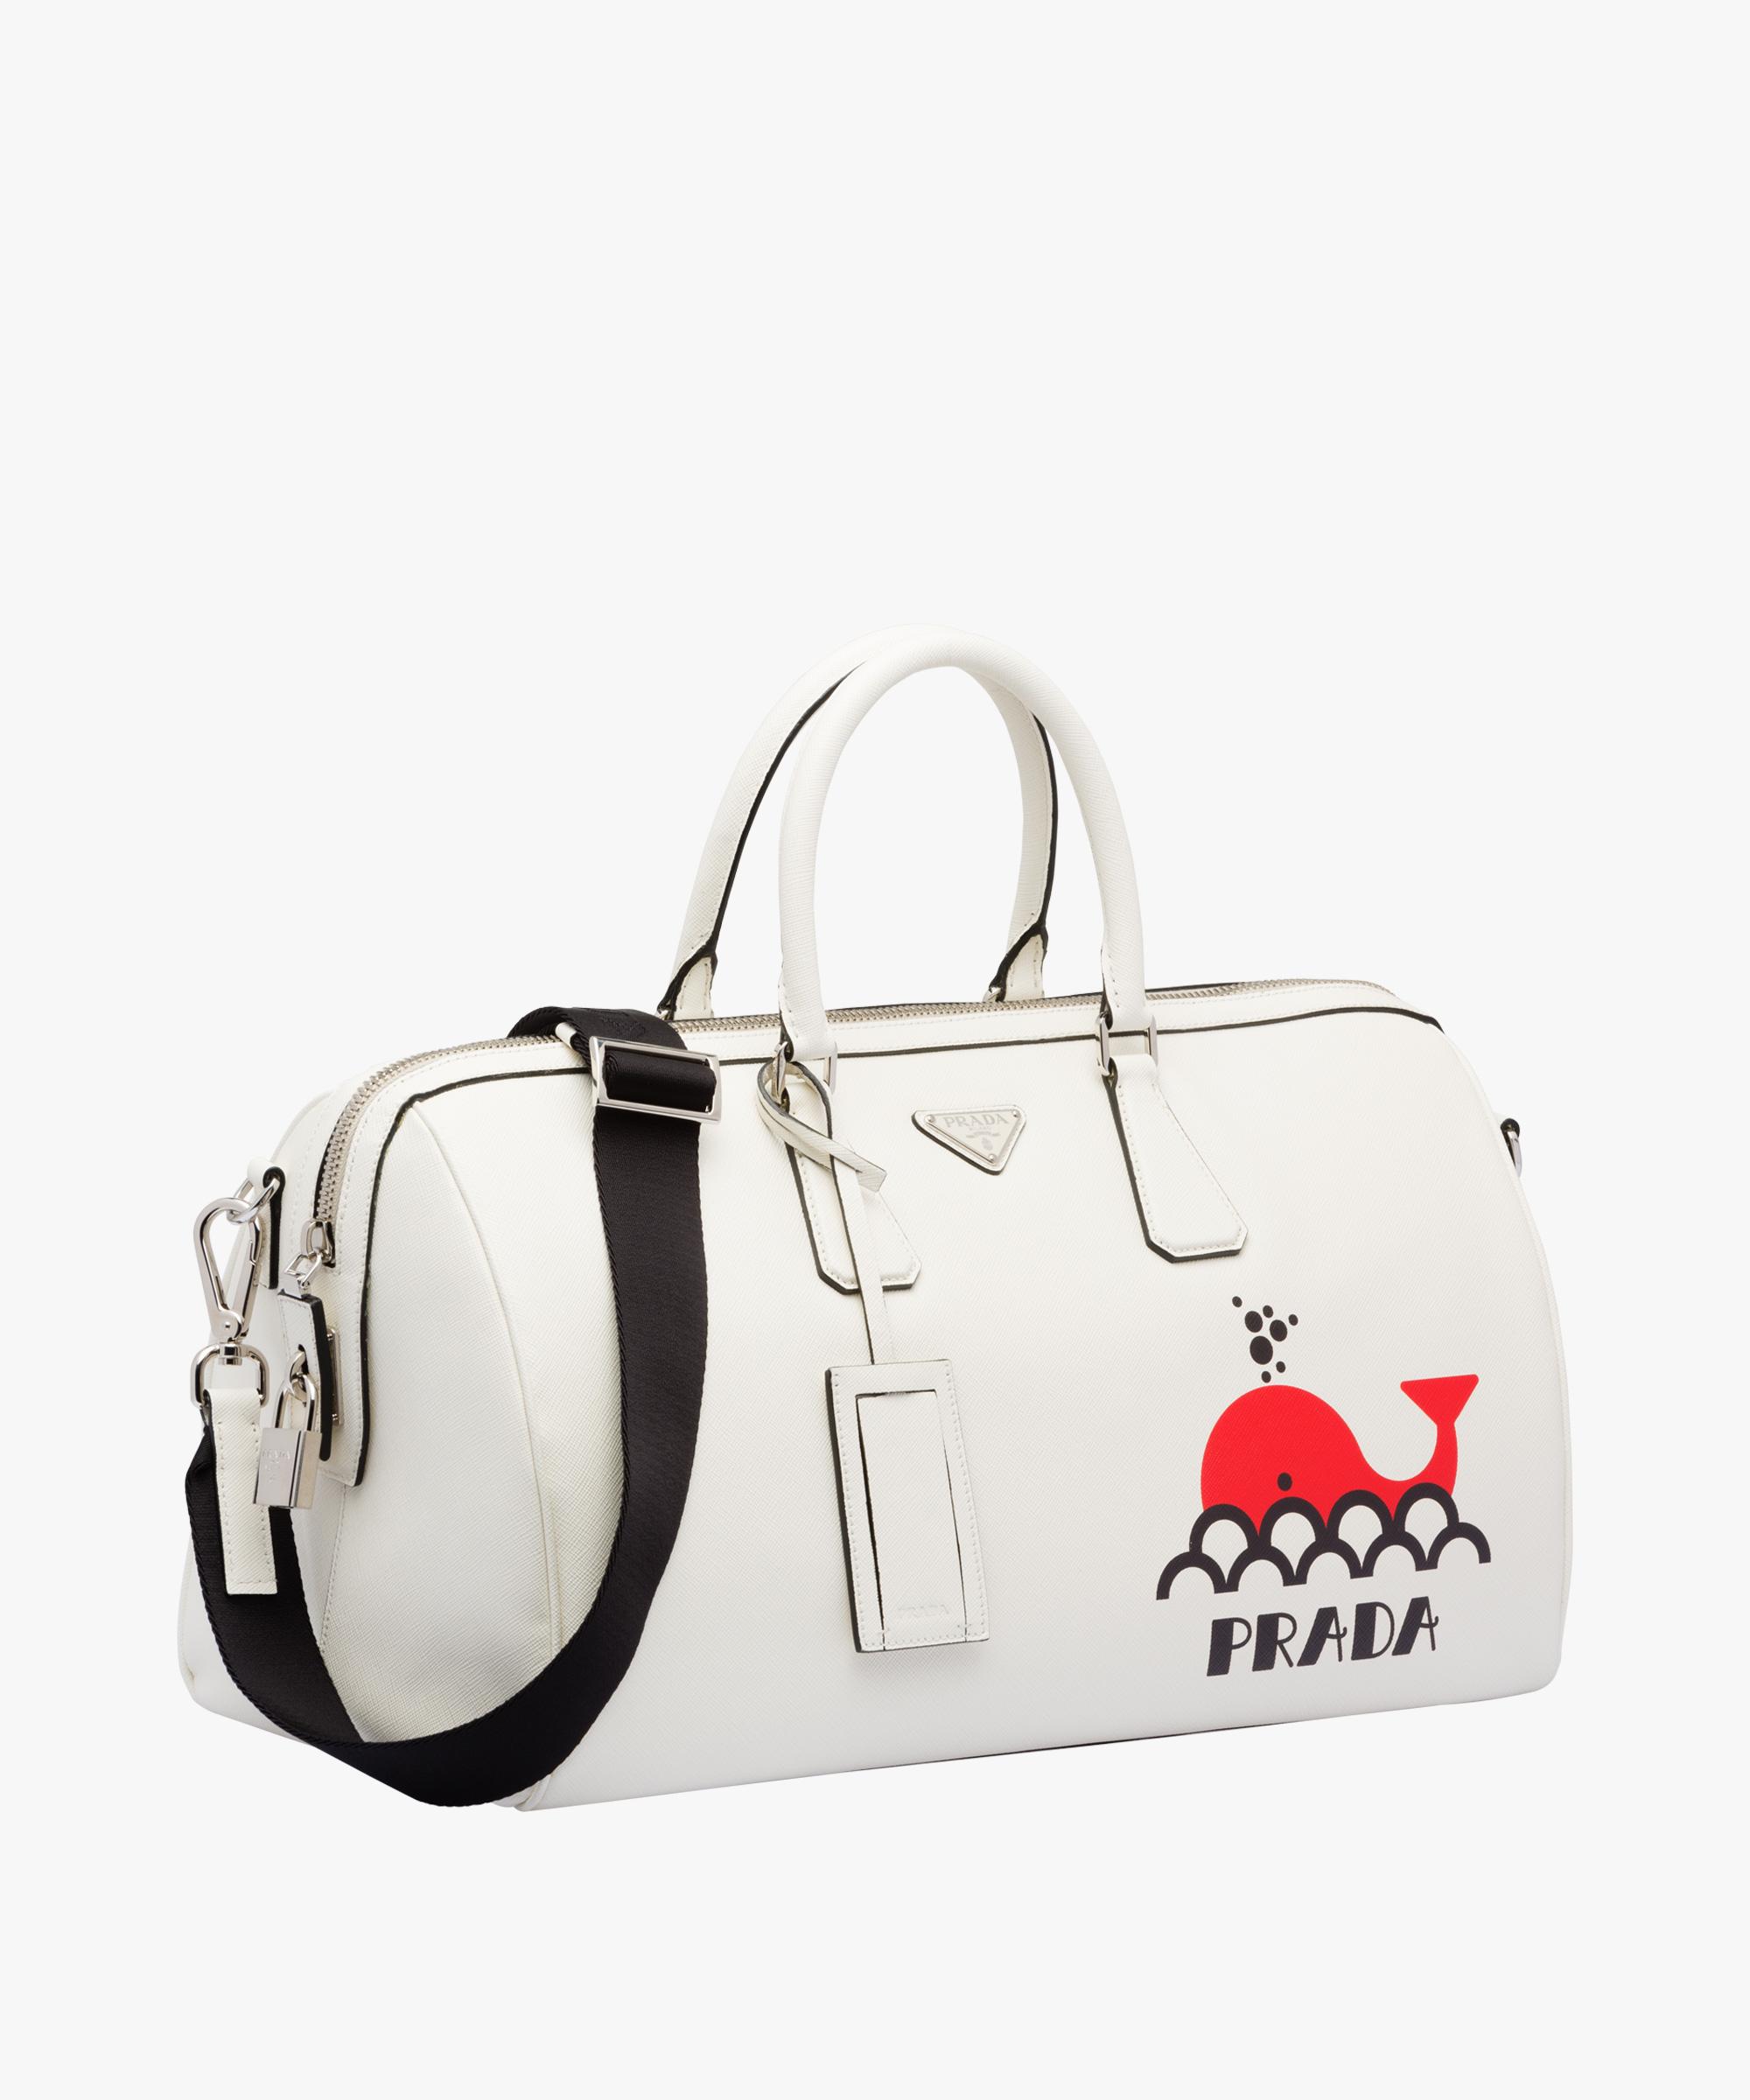 1640892bdb8f ... Printed Saffiano leather travel bag Prada WHITE RED ...